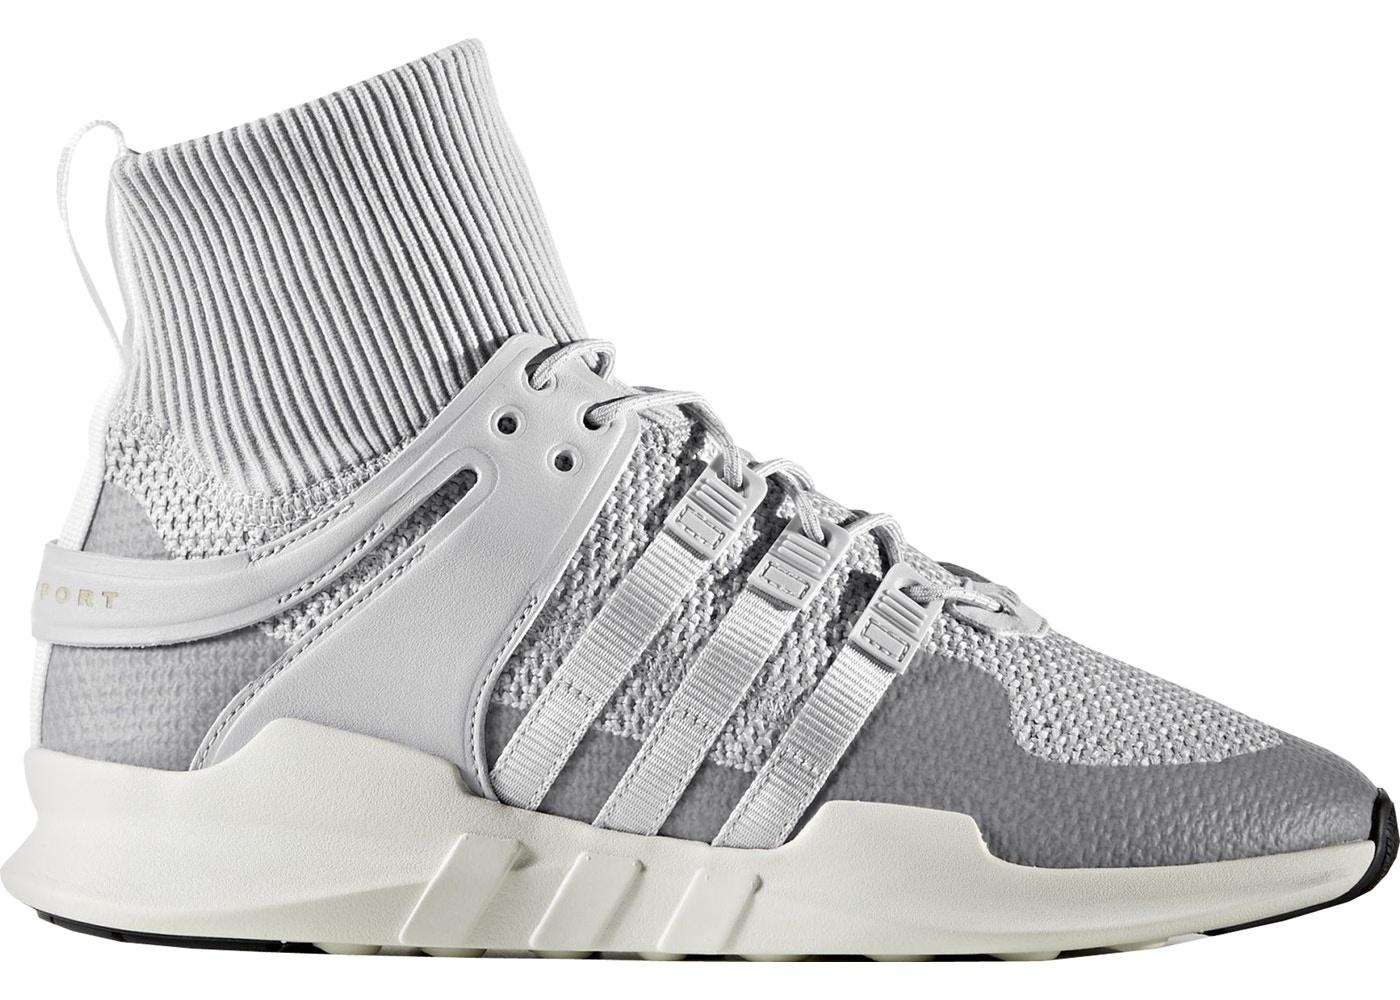 wholesale dealer 43192 e83db adidas sneakers Equipment Support Adv men gray